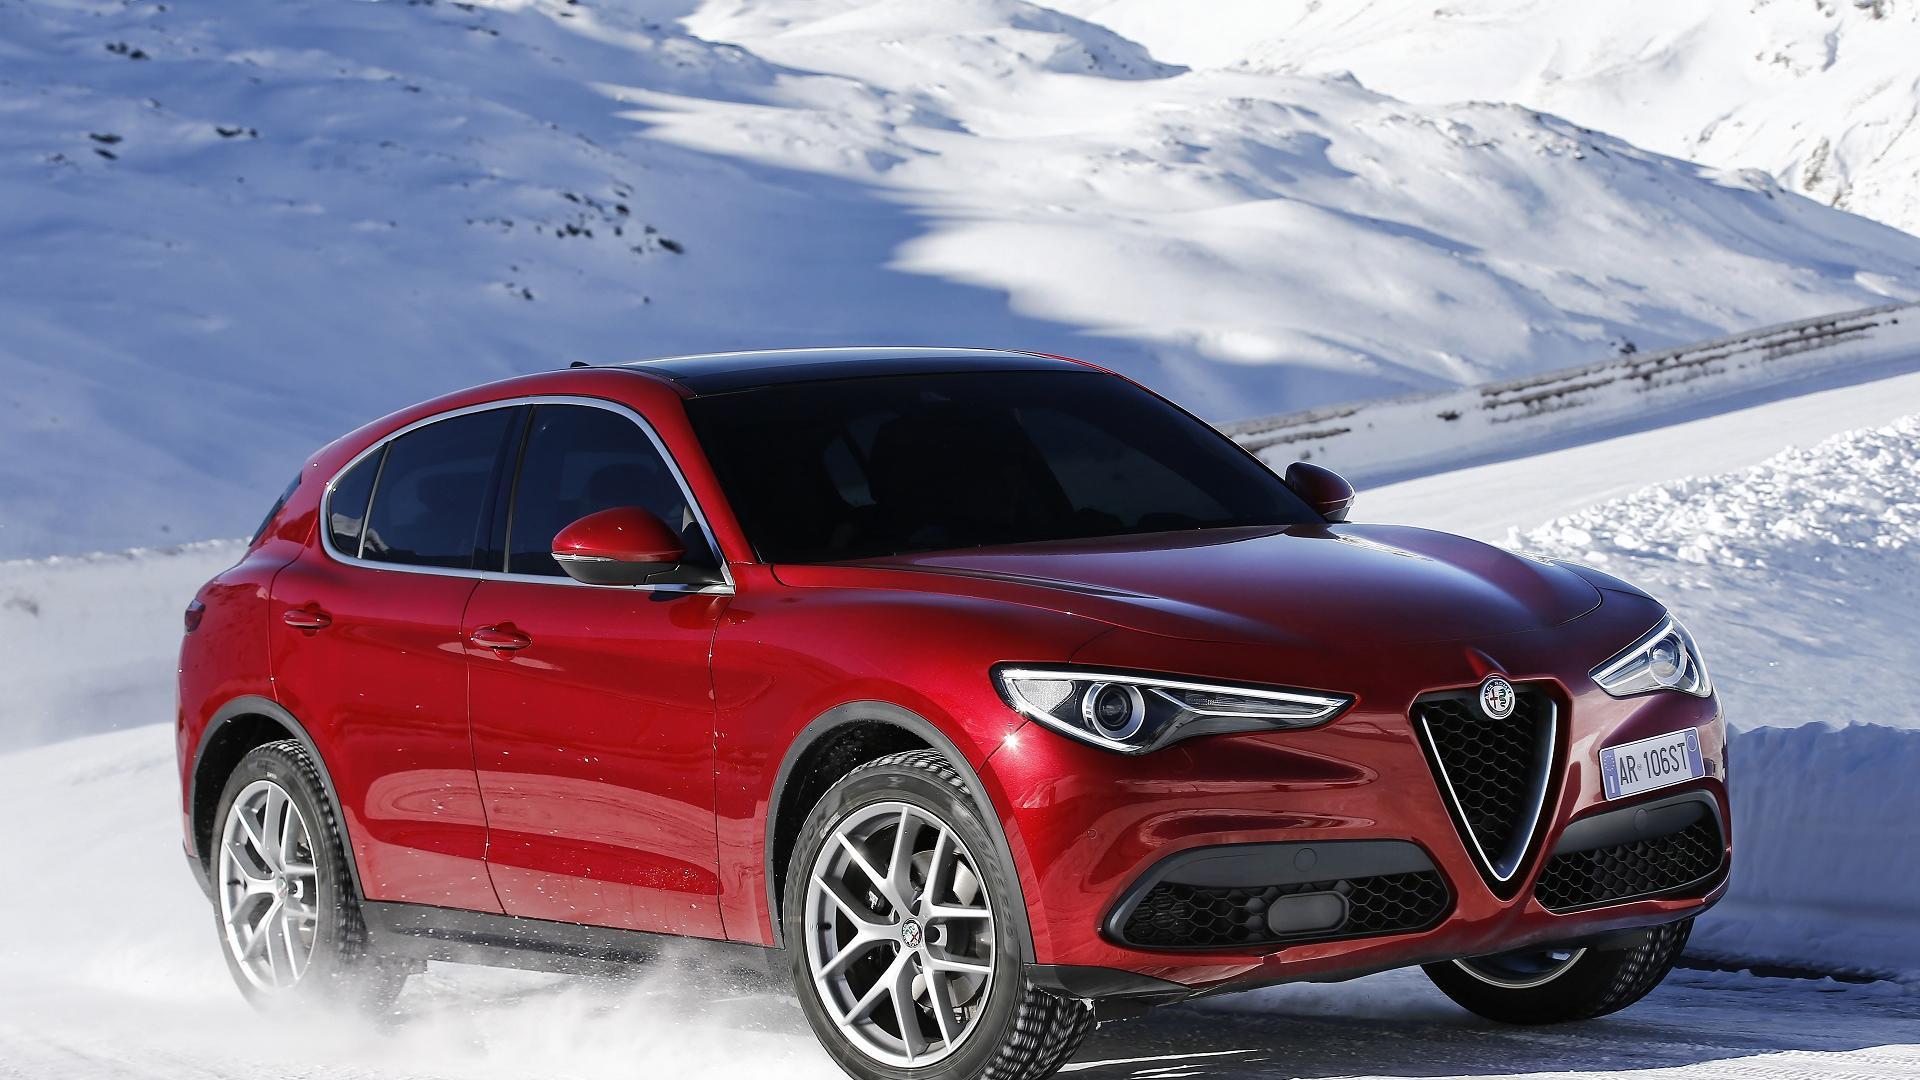 Fiat Tipo i Alfa Romeo Stelvio triumfują • AutoCentrum